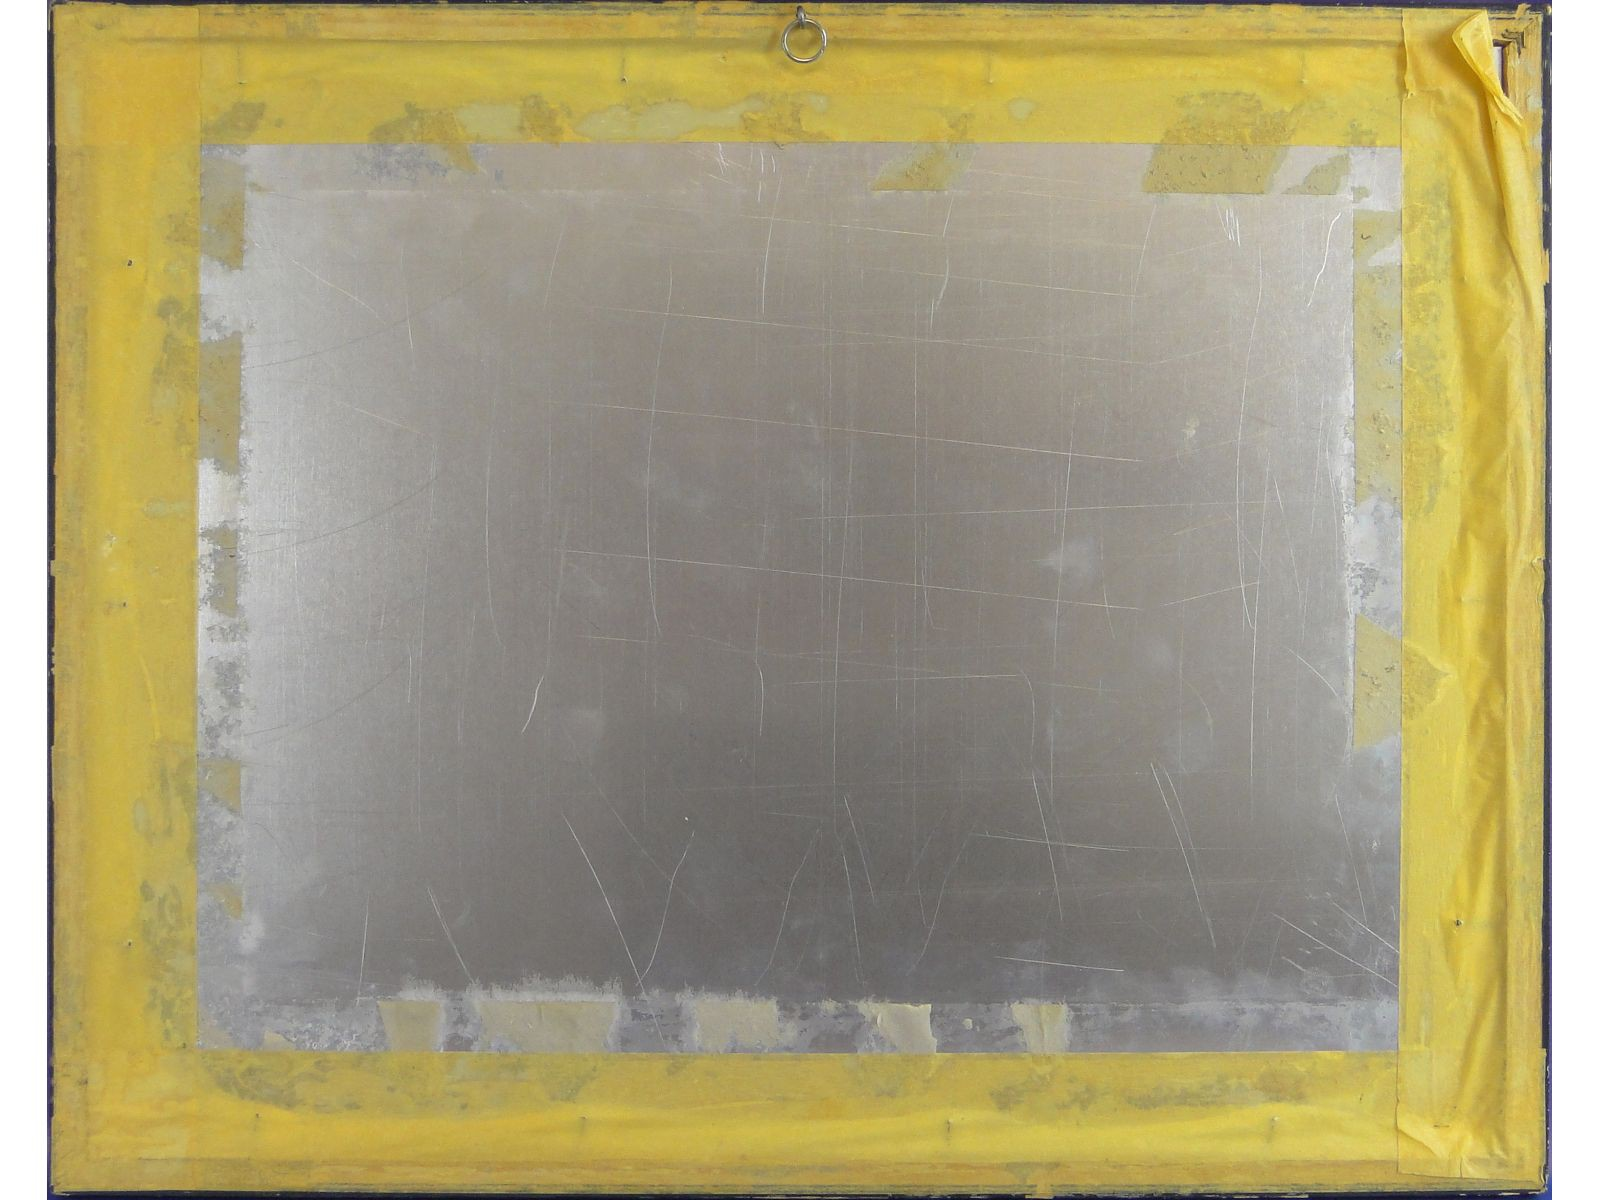 DSC05900.JPG (1600×1200)